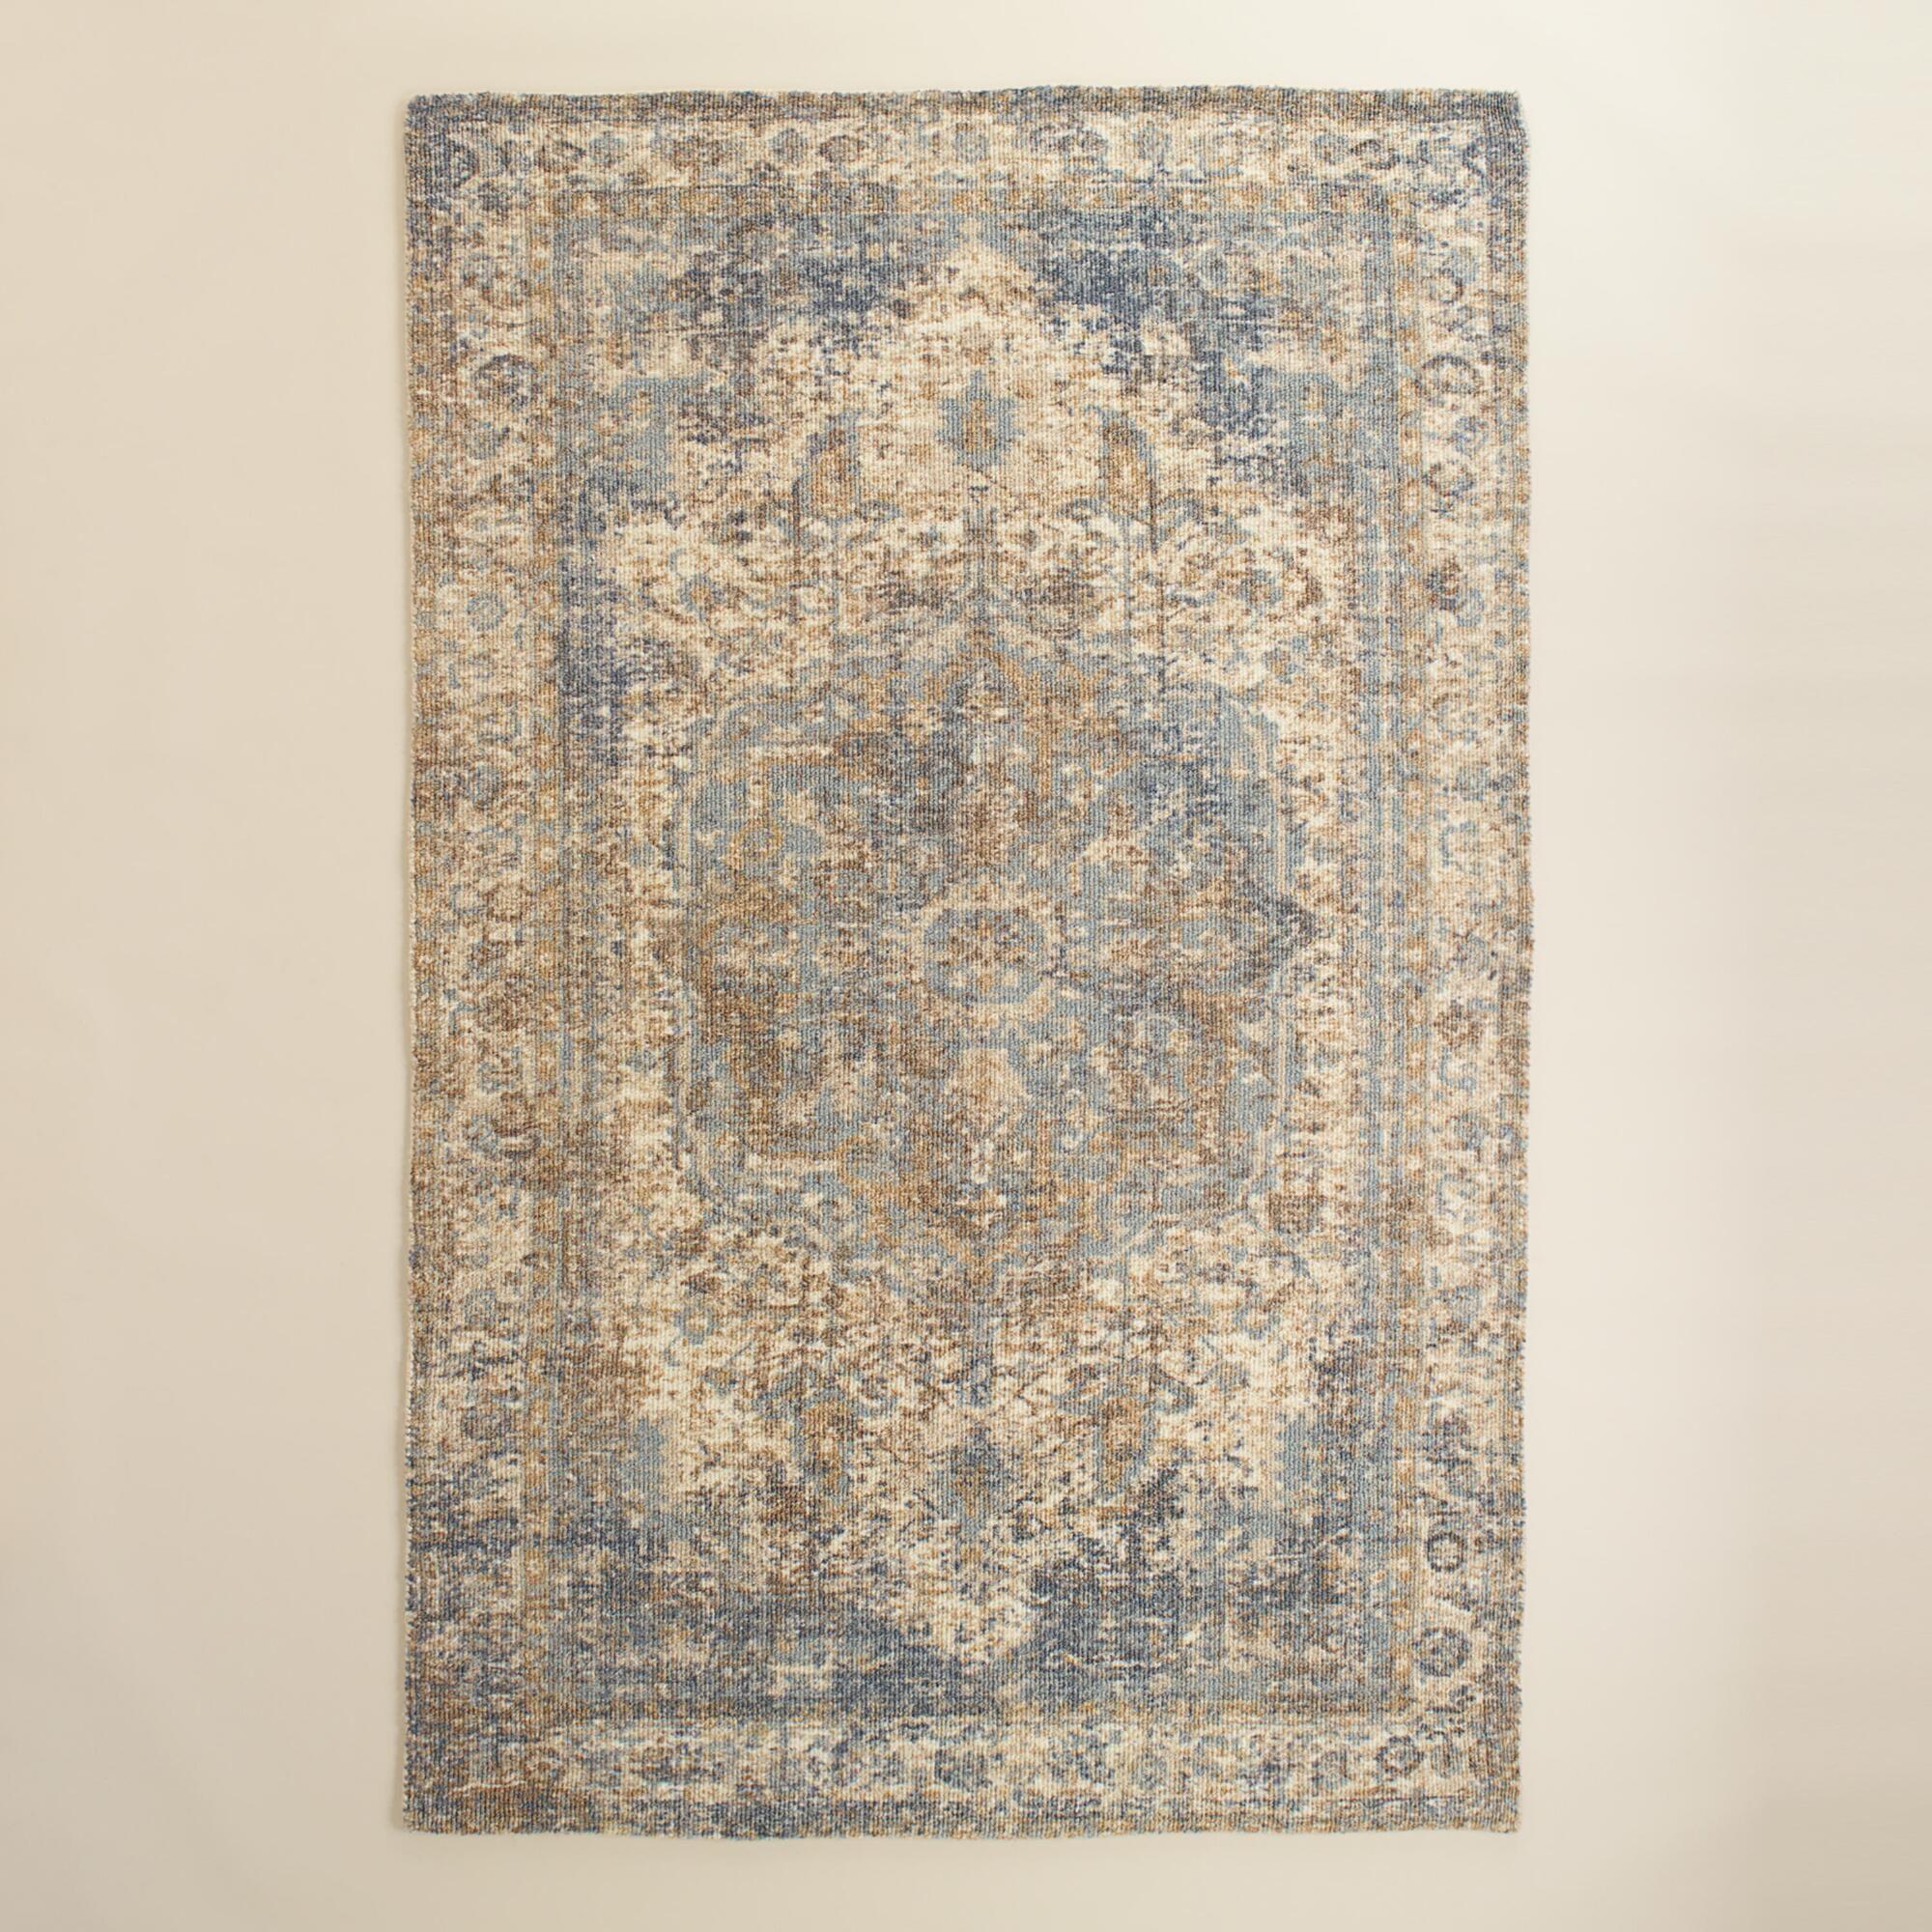 5x8 blue gray print tufted nylon veronica area rug | nylon rugs